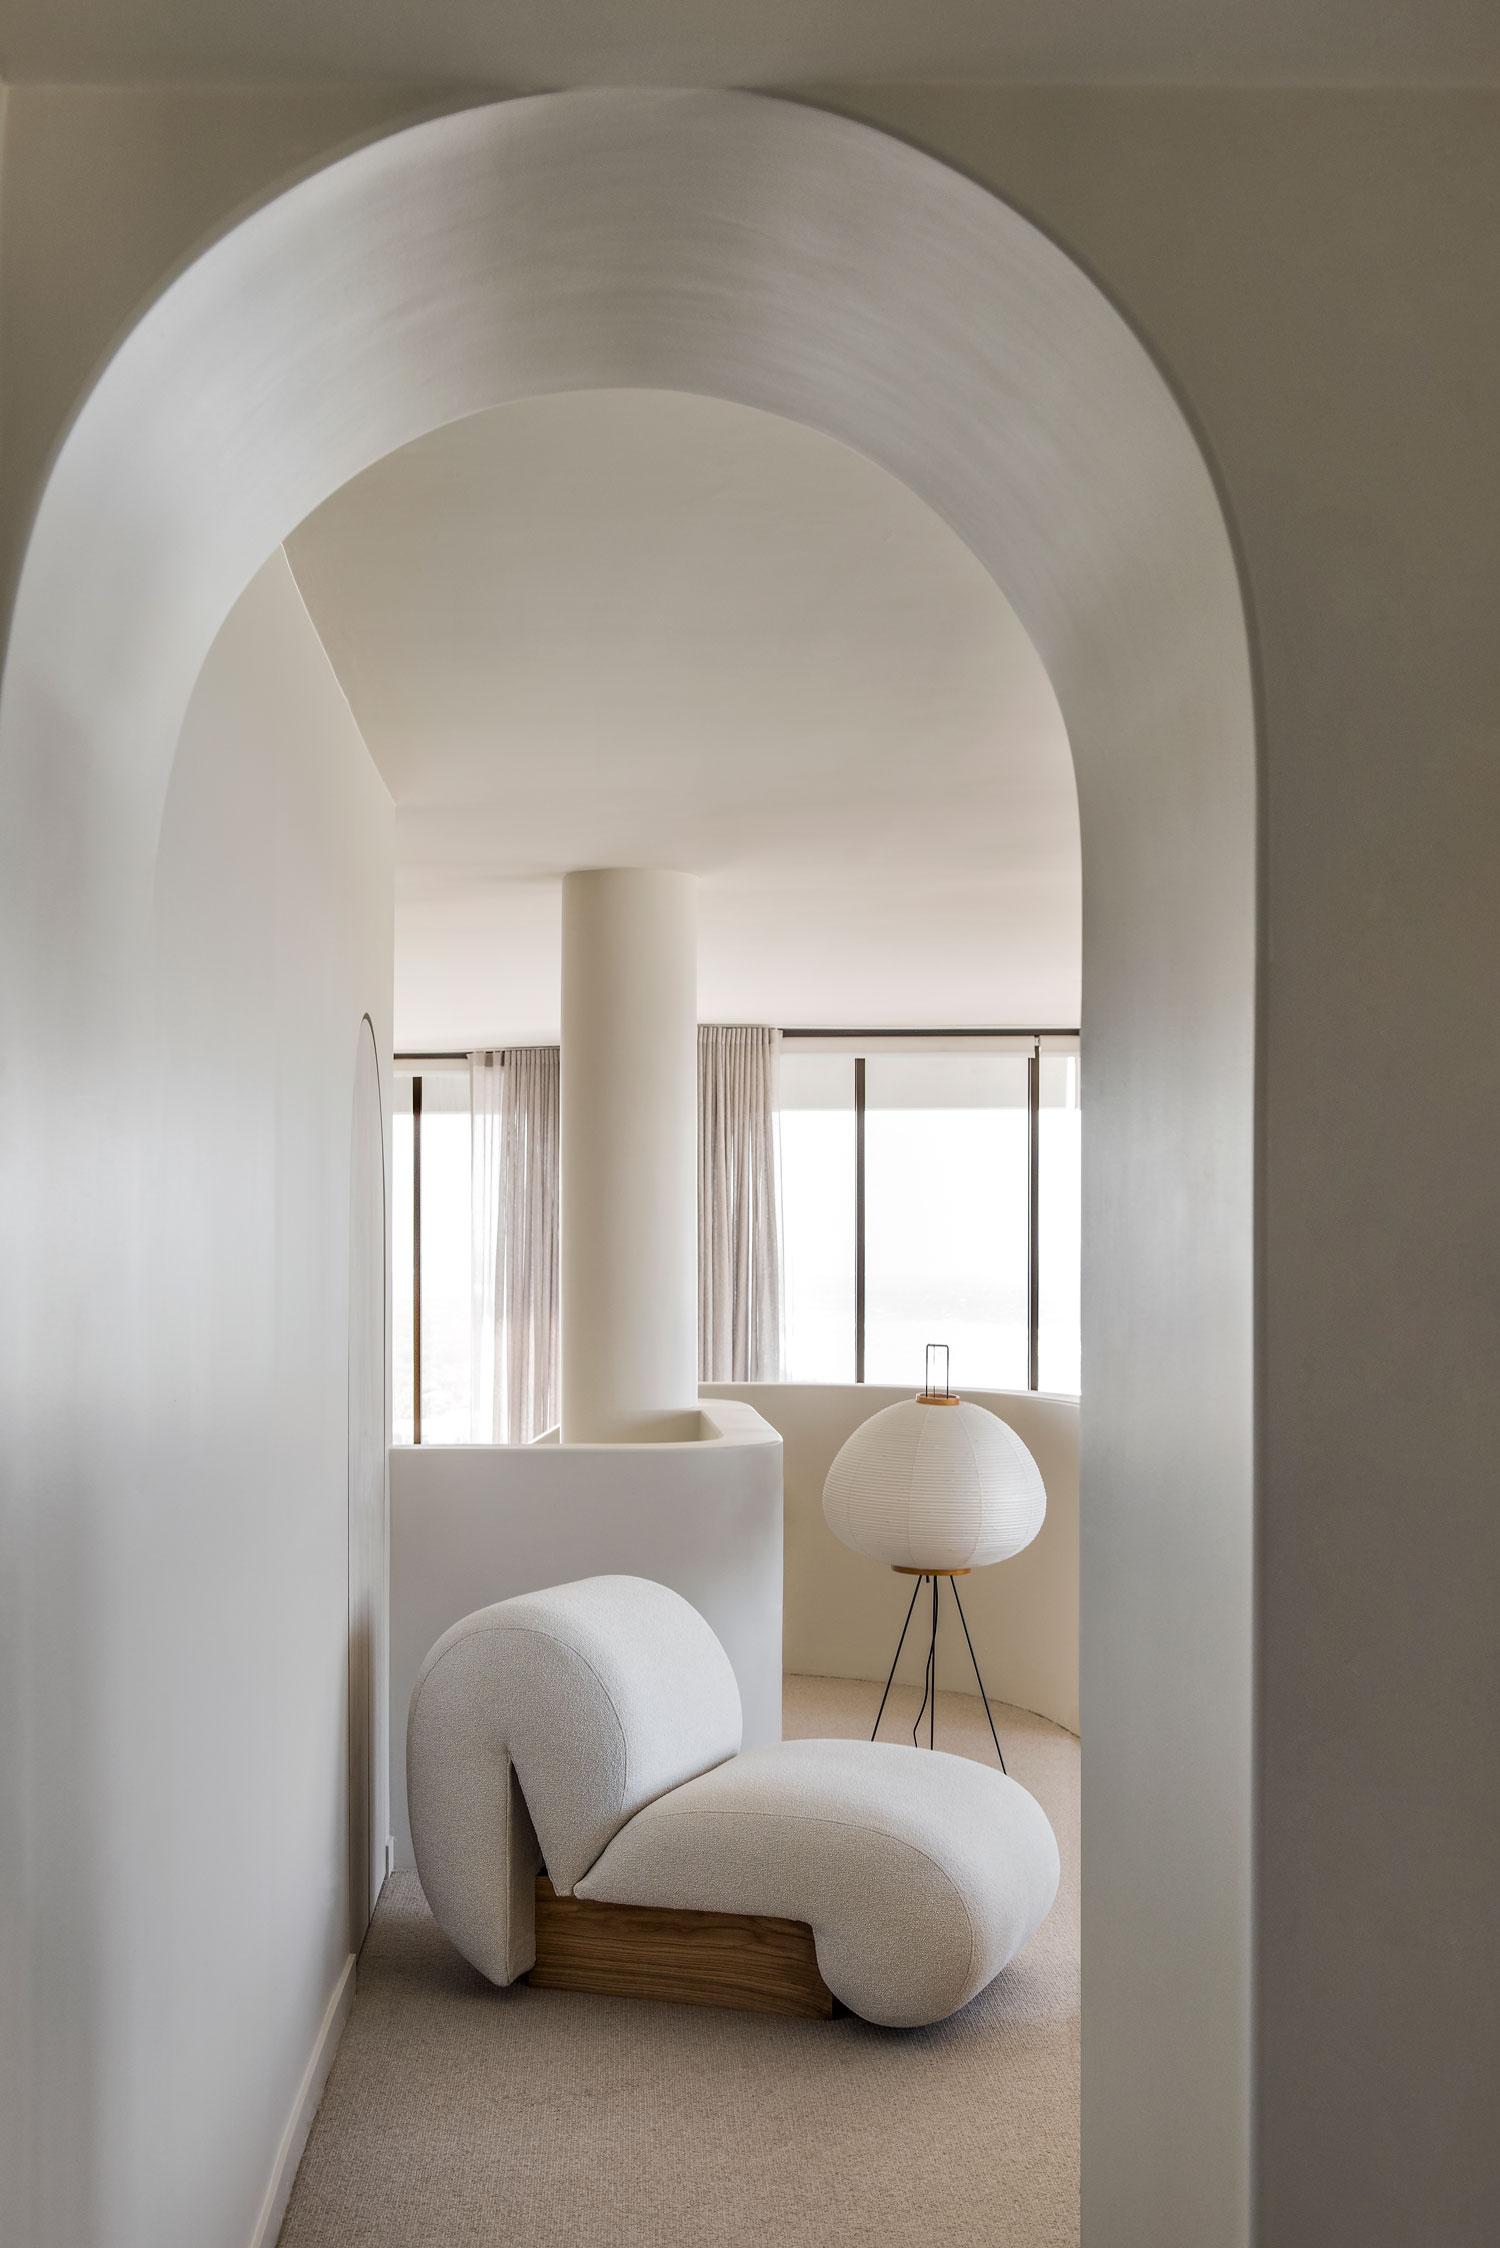 Penthouse M in Gold Coast, Australian Apartment Interiors, Cjh Studio | Yellowtrace